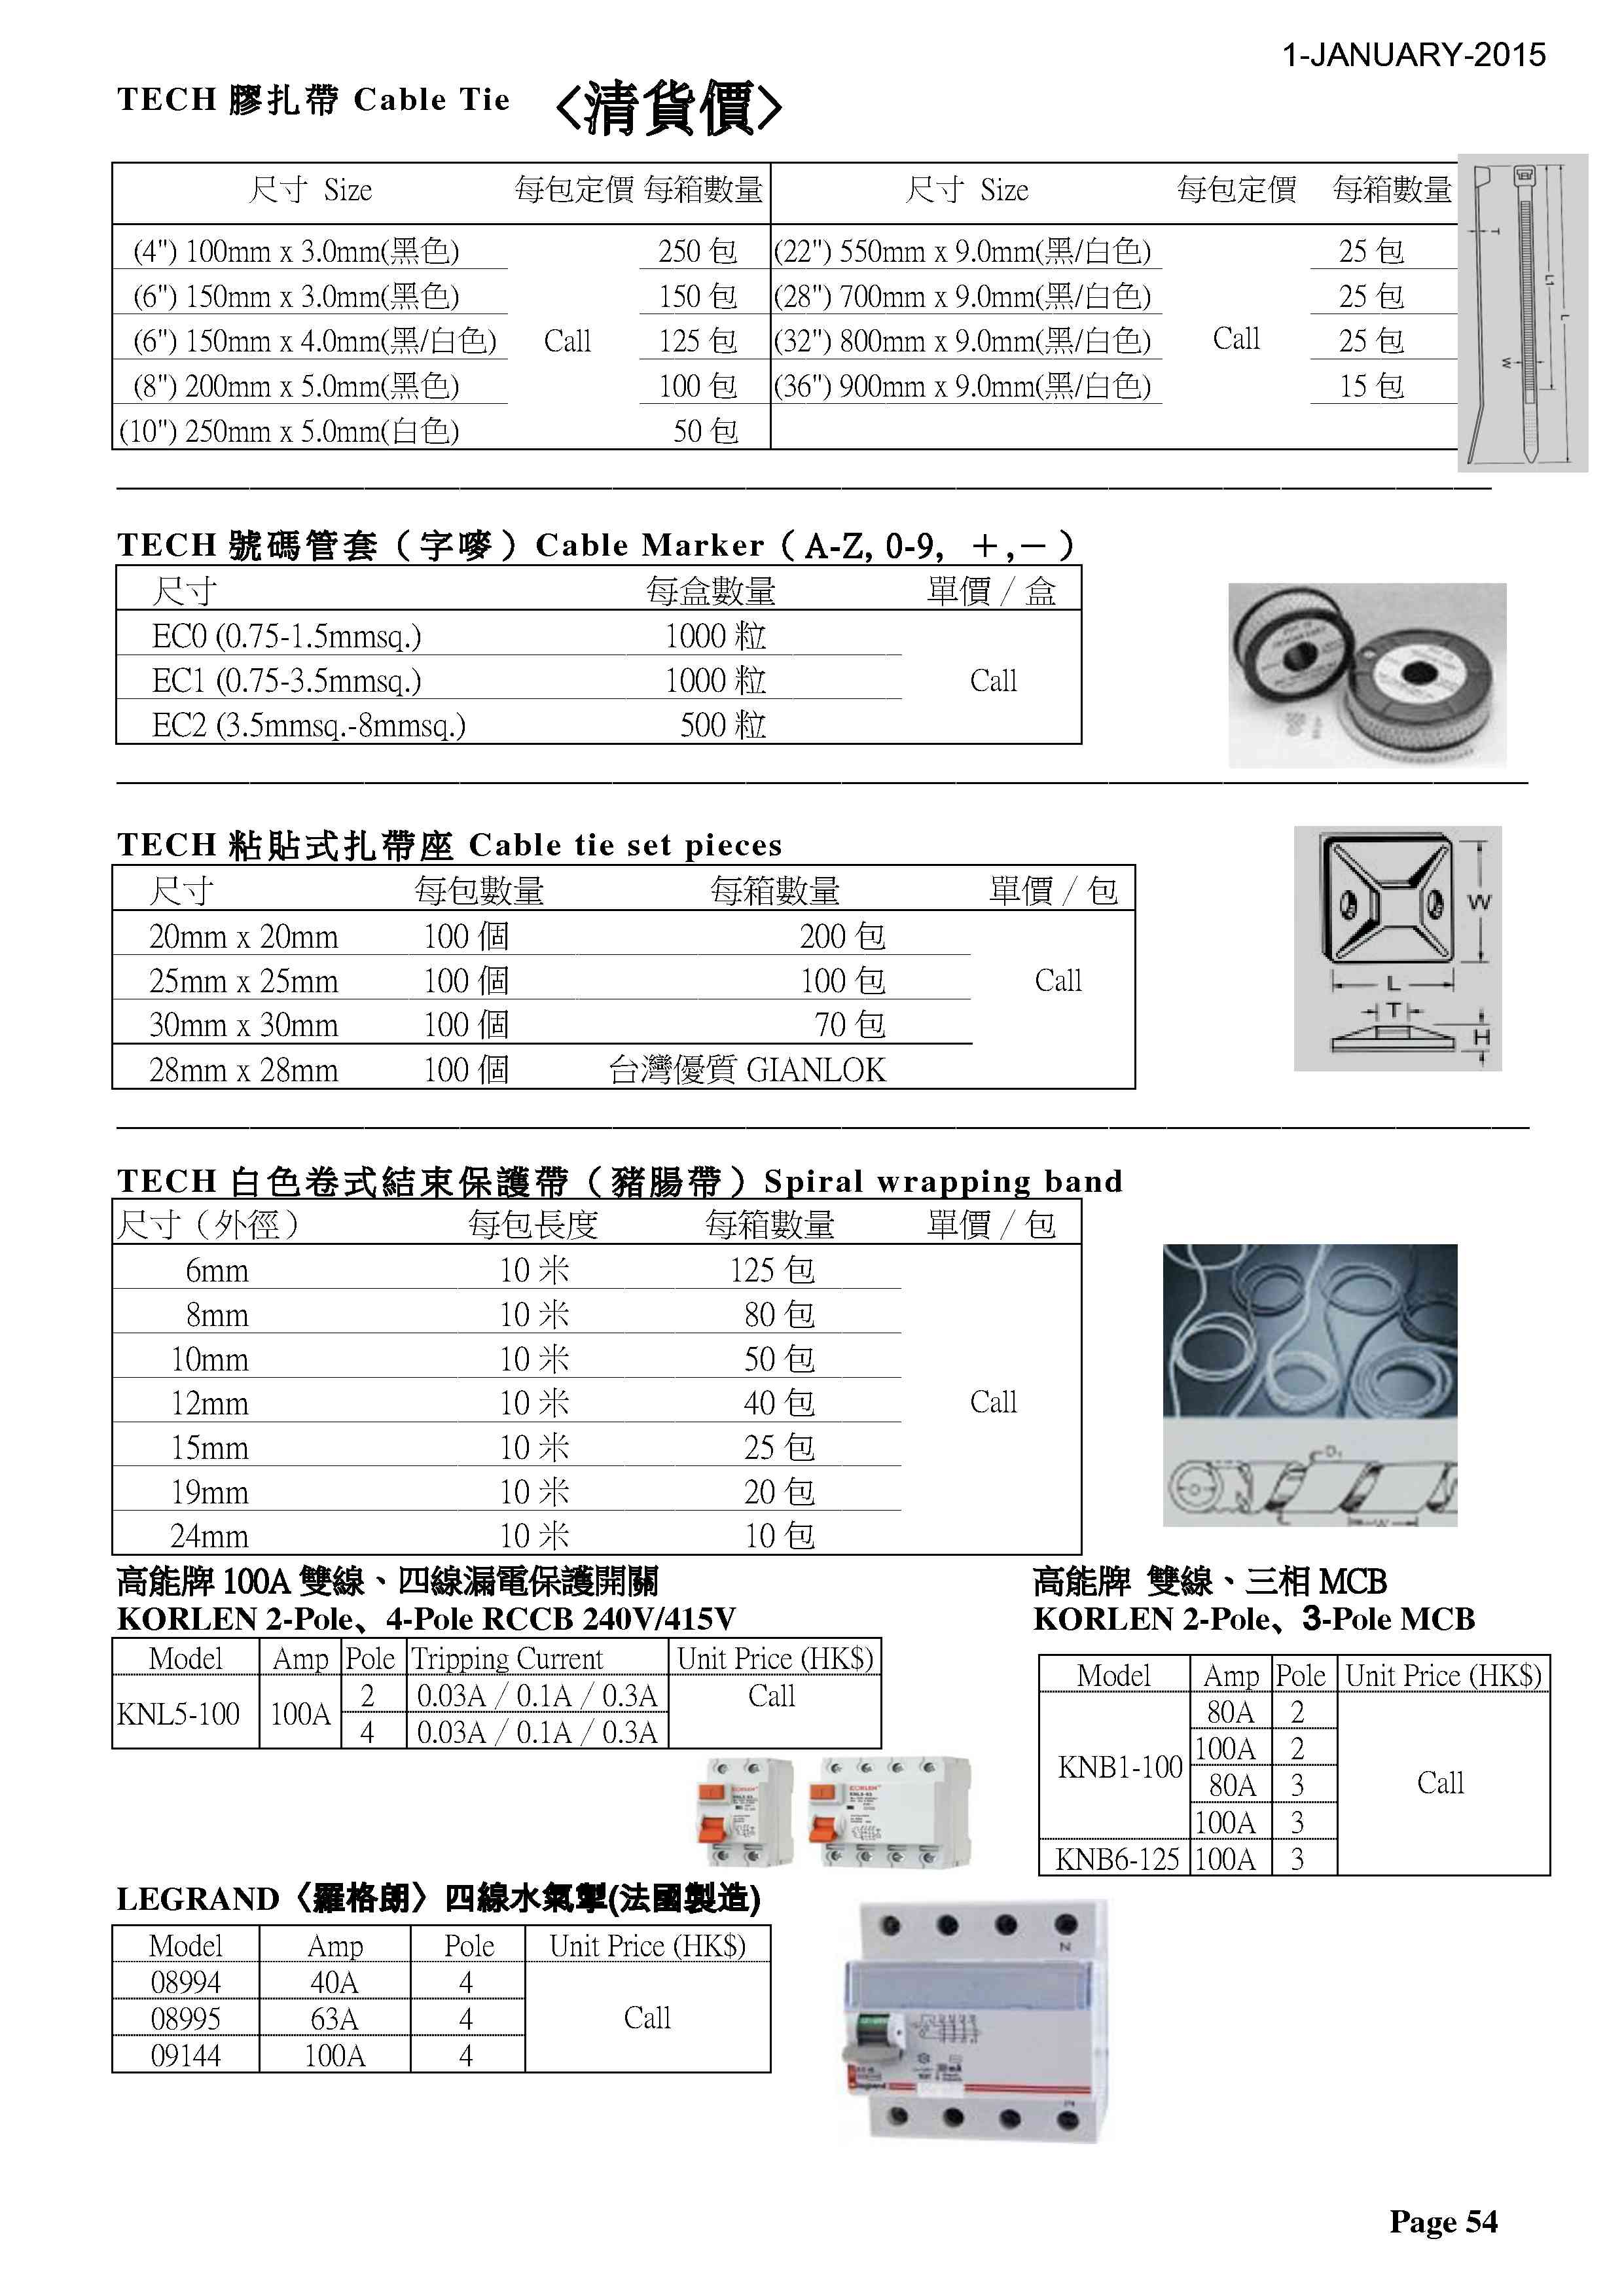 P54 - TECH 扎帶、子嘜、扎帶座及豬腸帶1